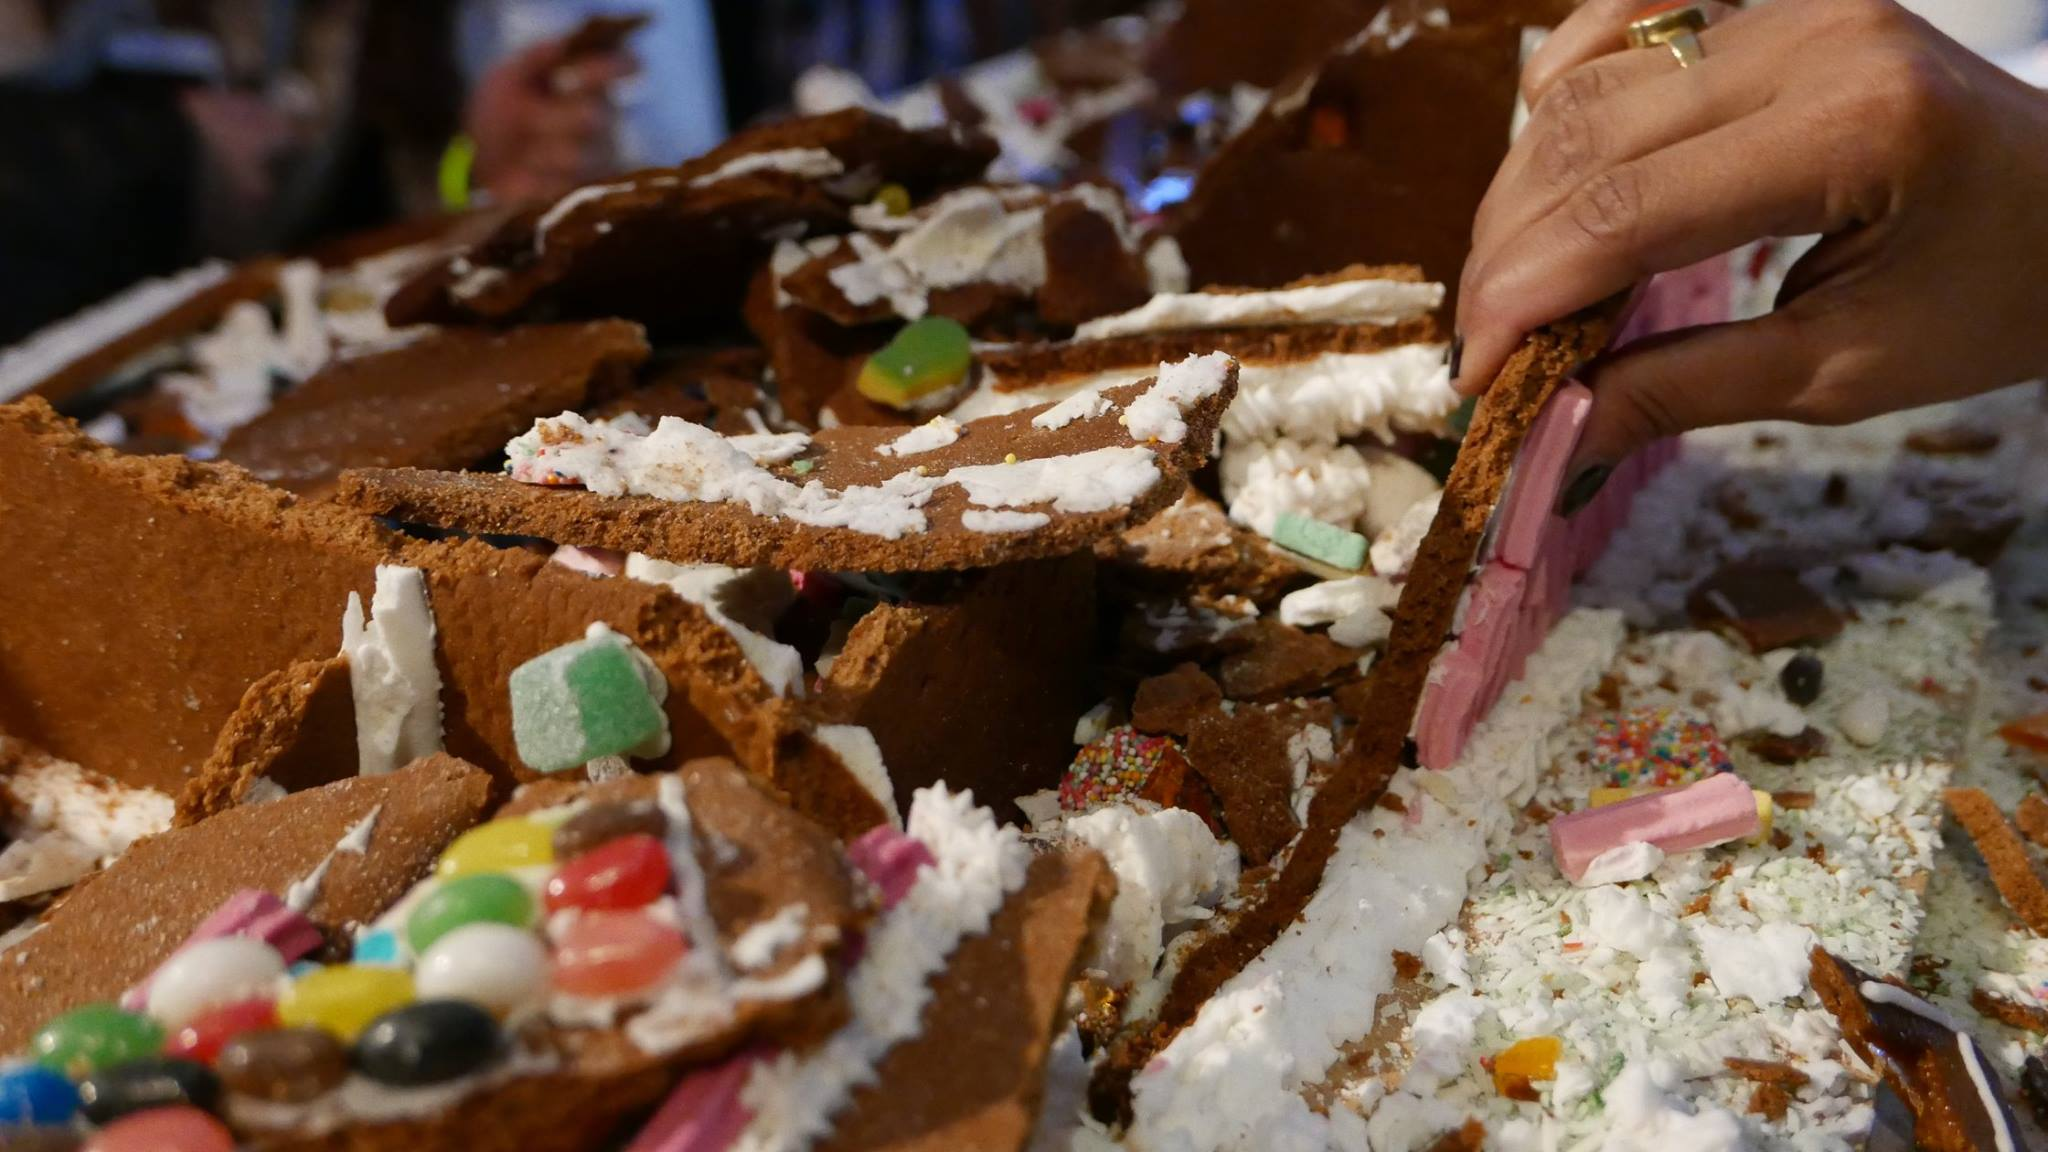 Gingerbread Demolition